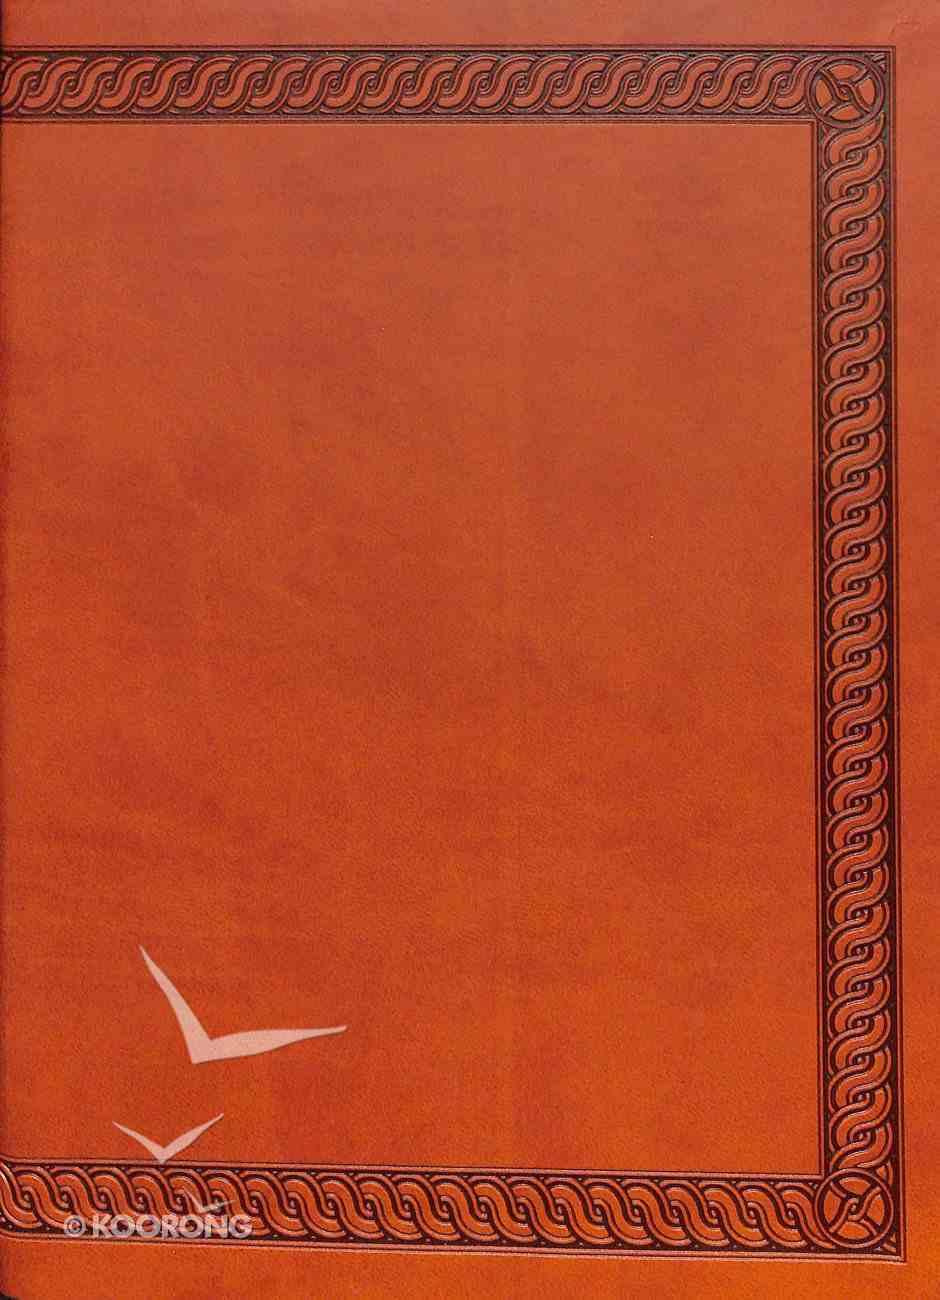 NKJV Jeremiah Study Bible, Brown Leatherluxe Premium Imitation Leather